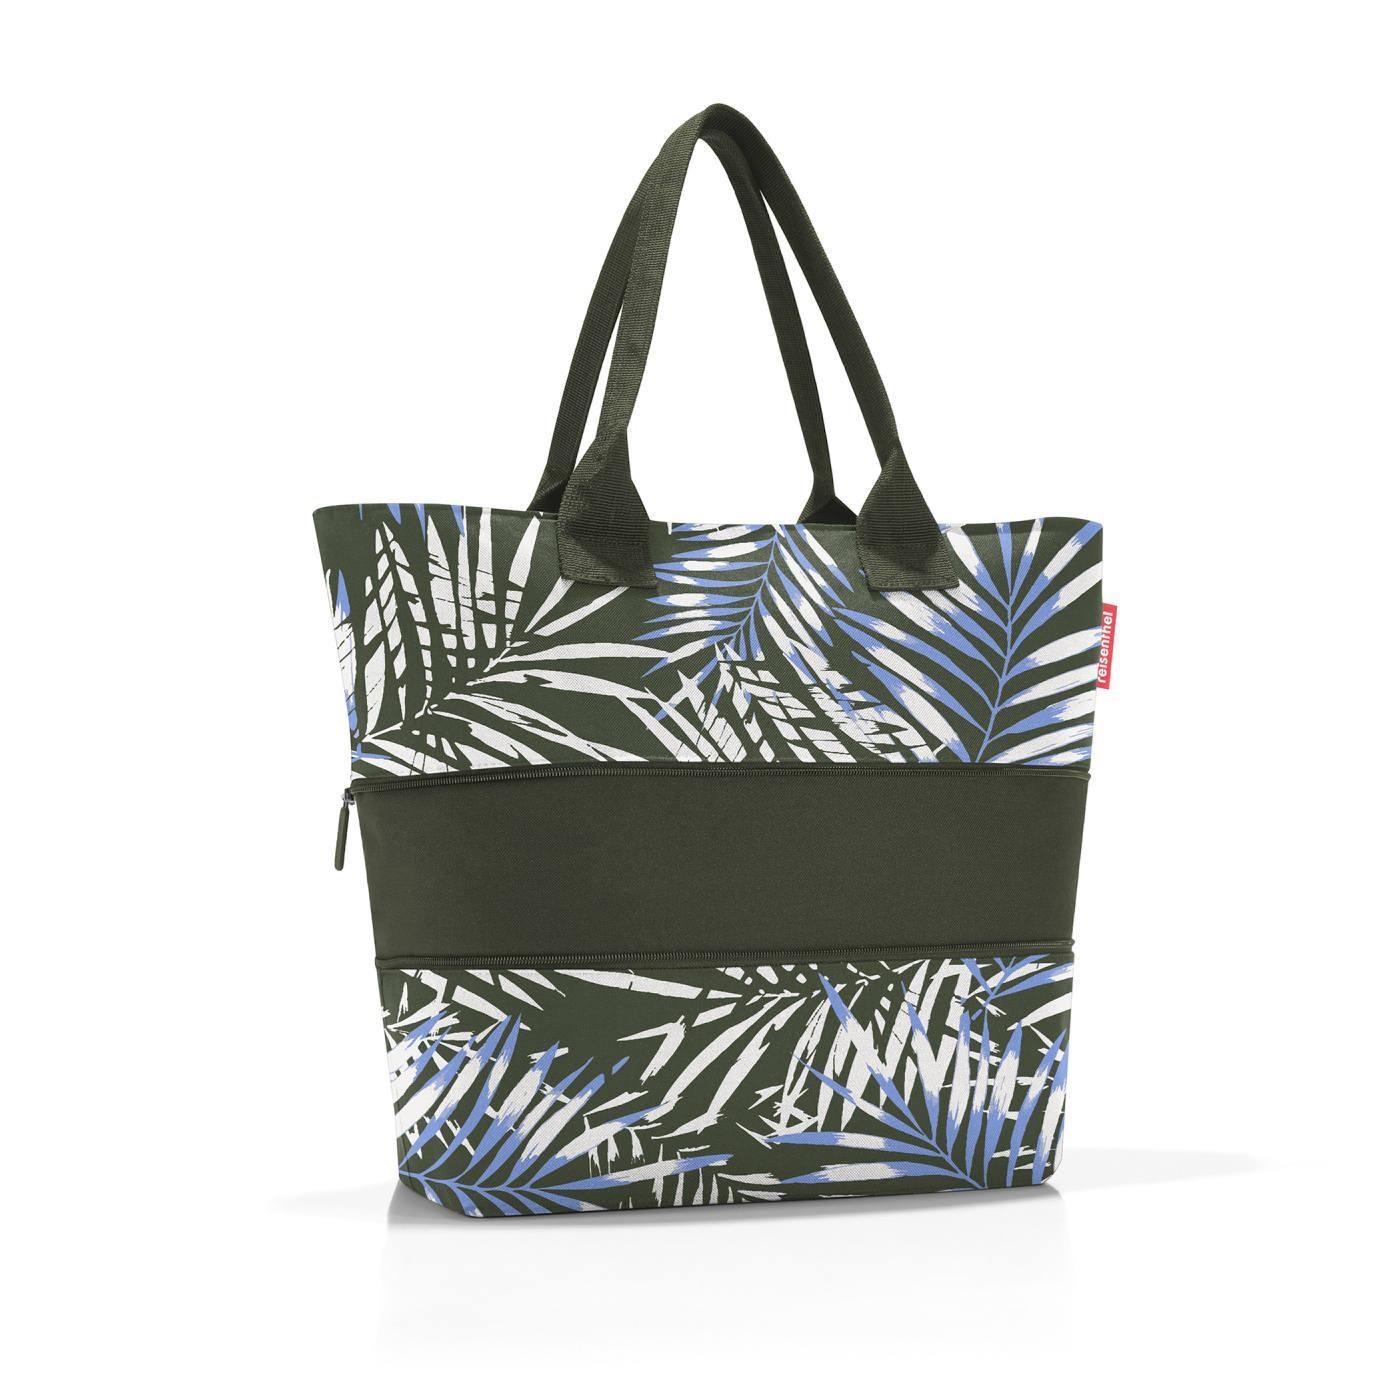 Chytrá taška přes rameno Shopper e1 jungle trail green_0